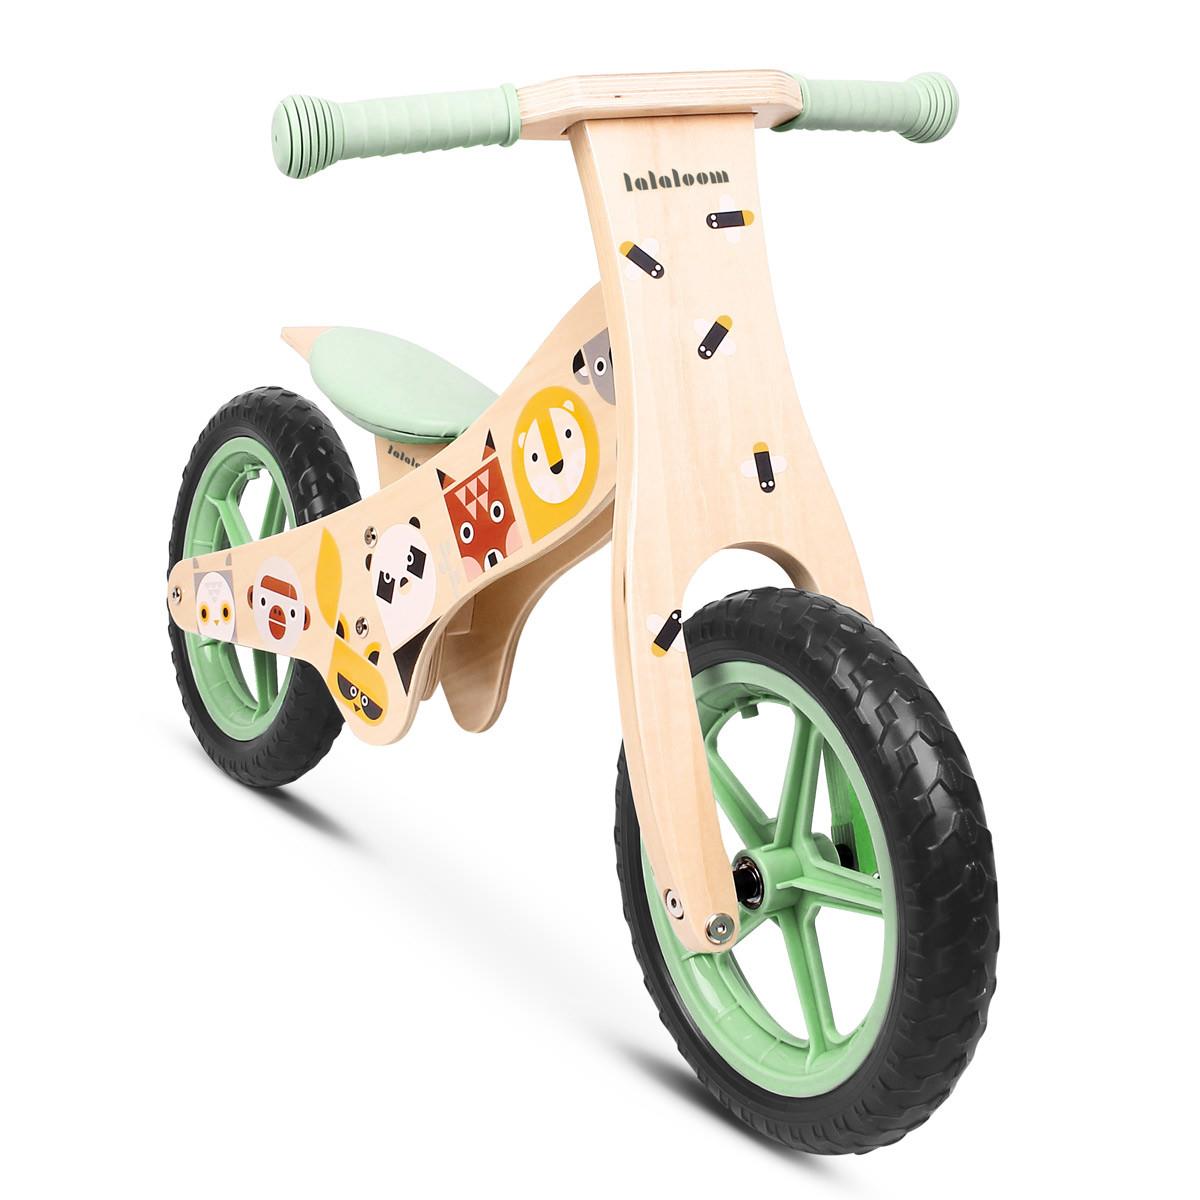 Bicicleta de equilibrio en madera - Wild